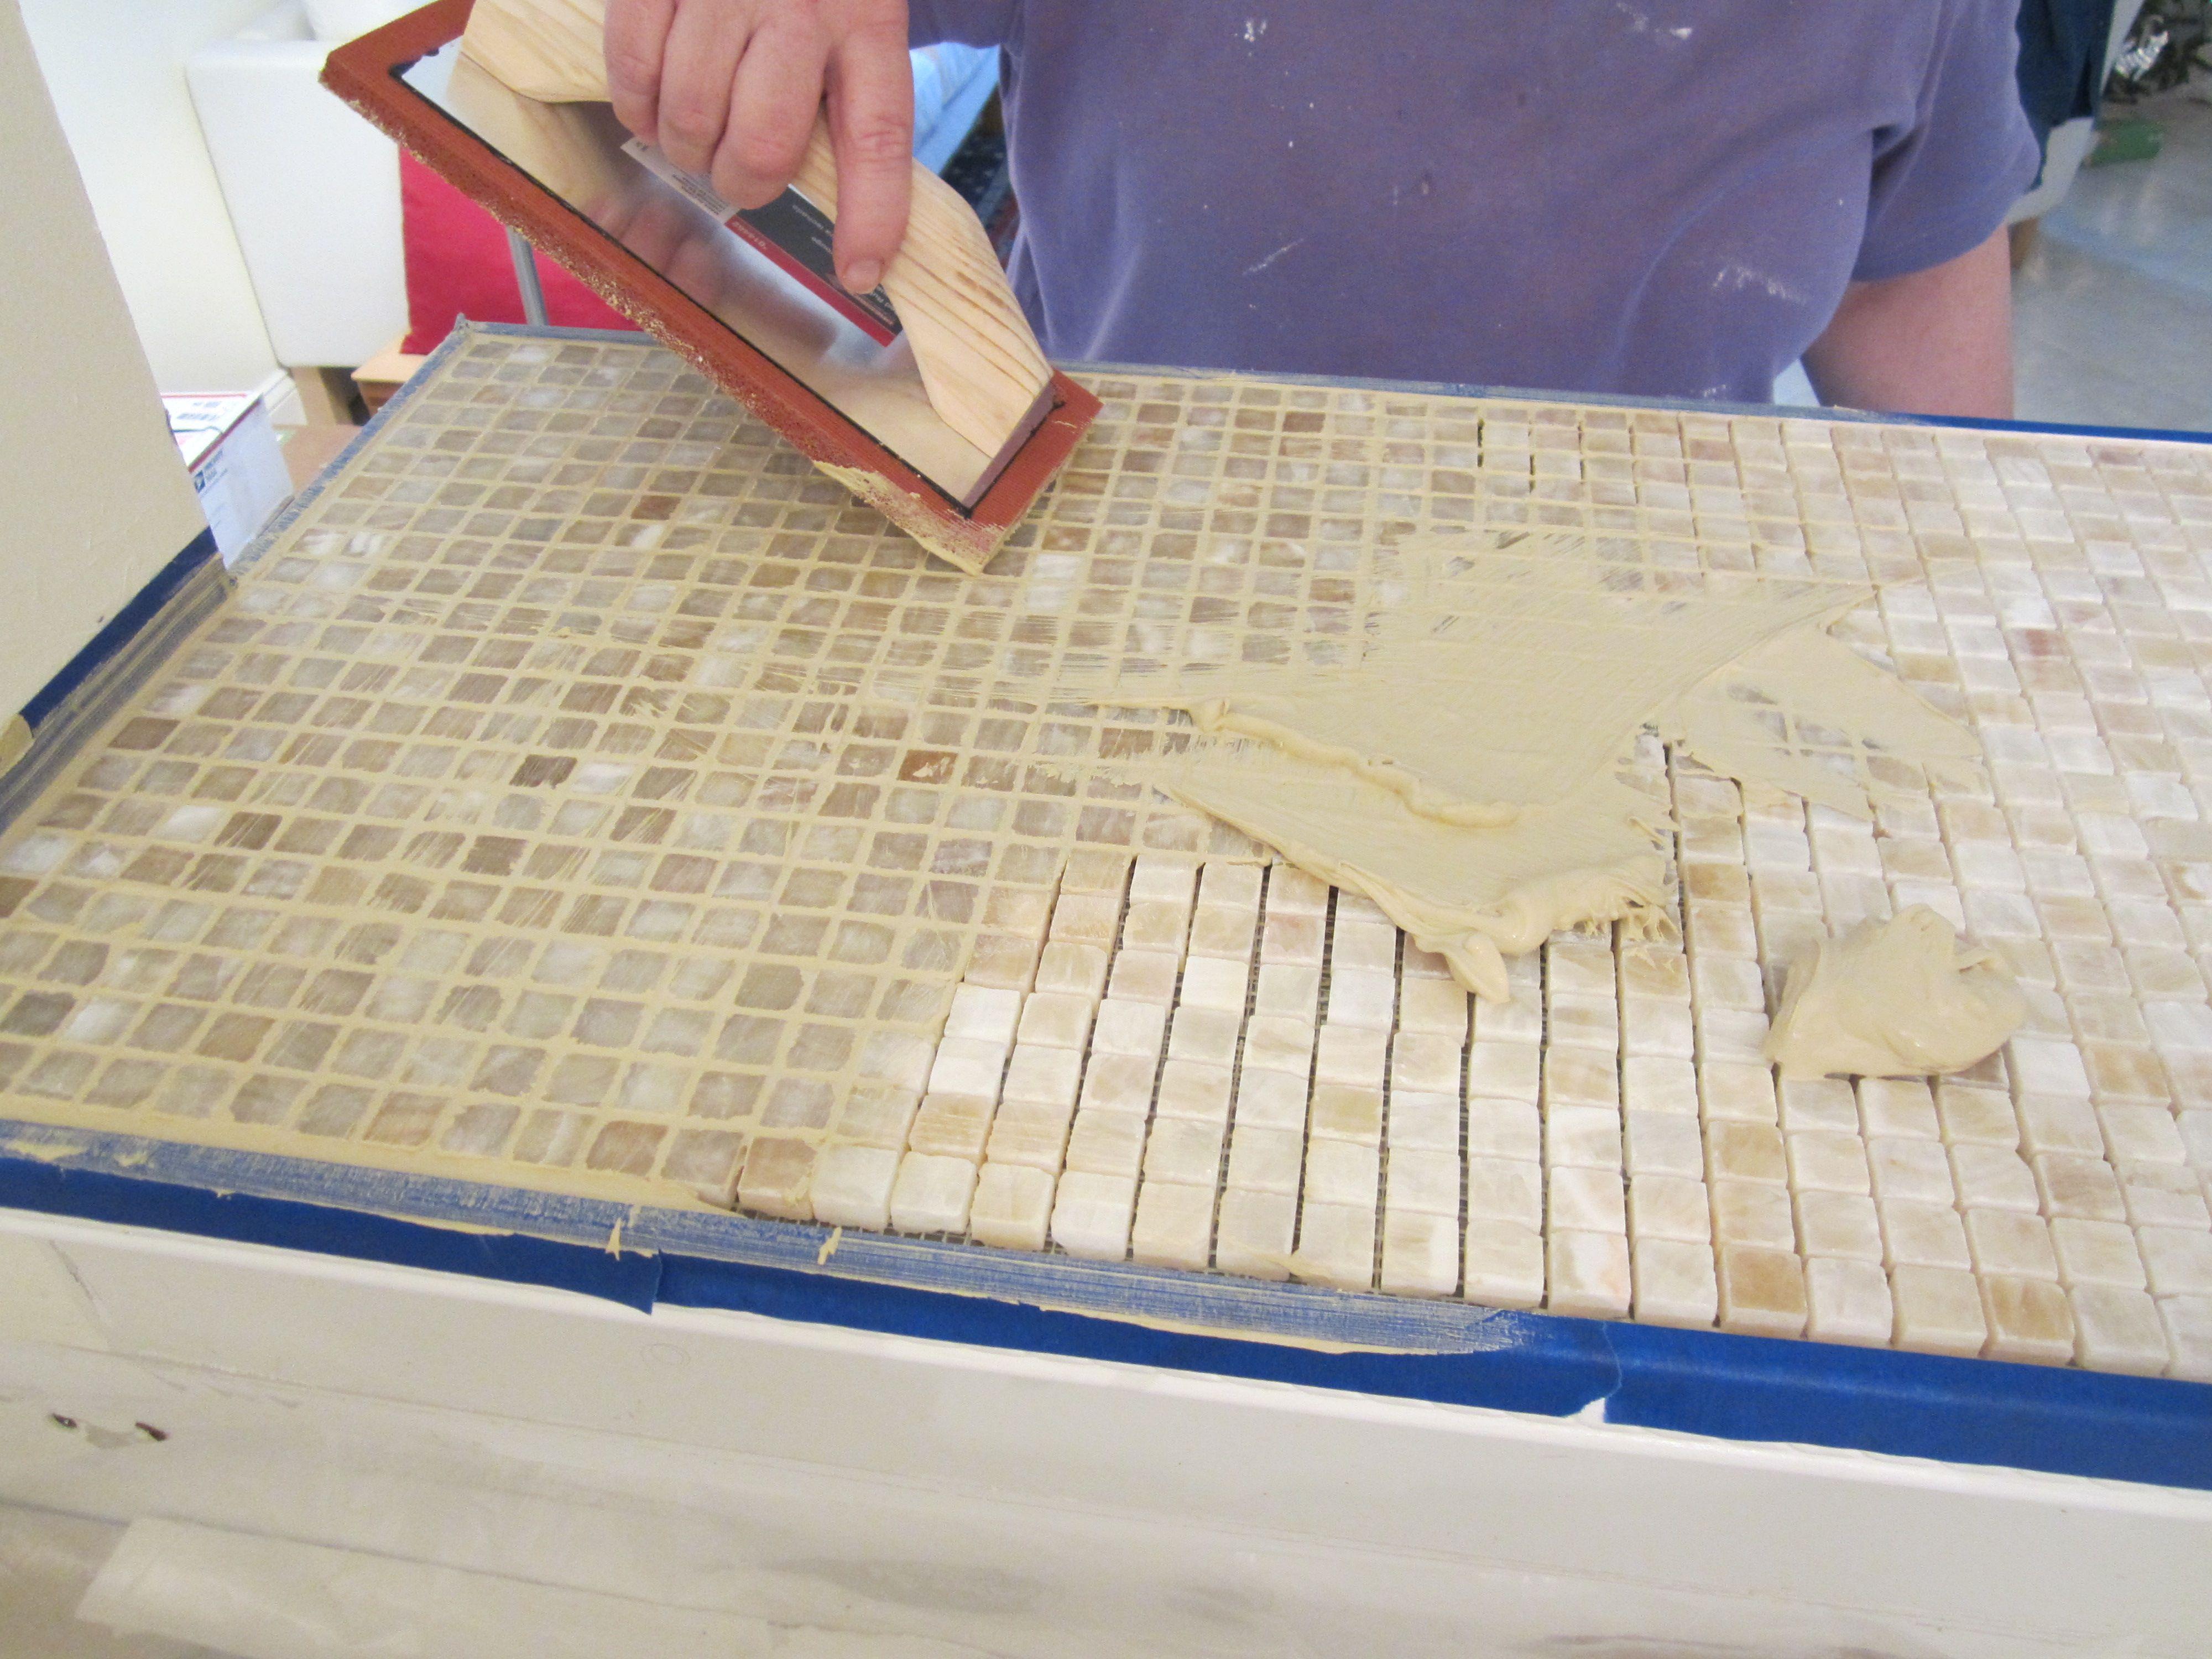 superior grouting tile Part - 10: superior grouting tile idea